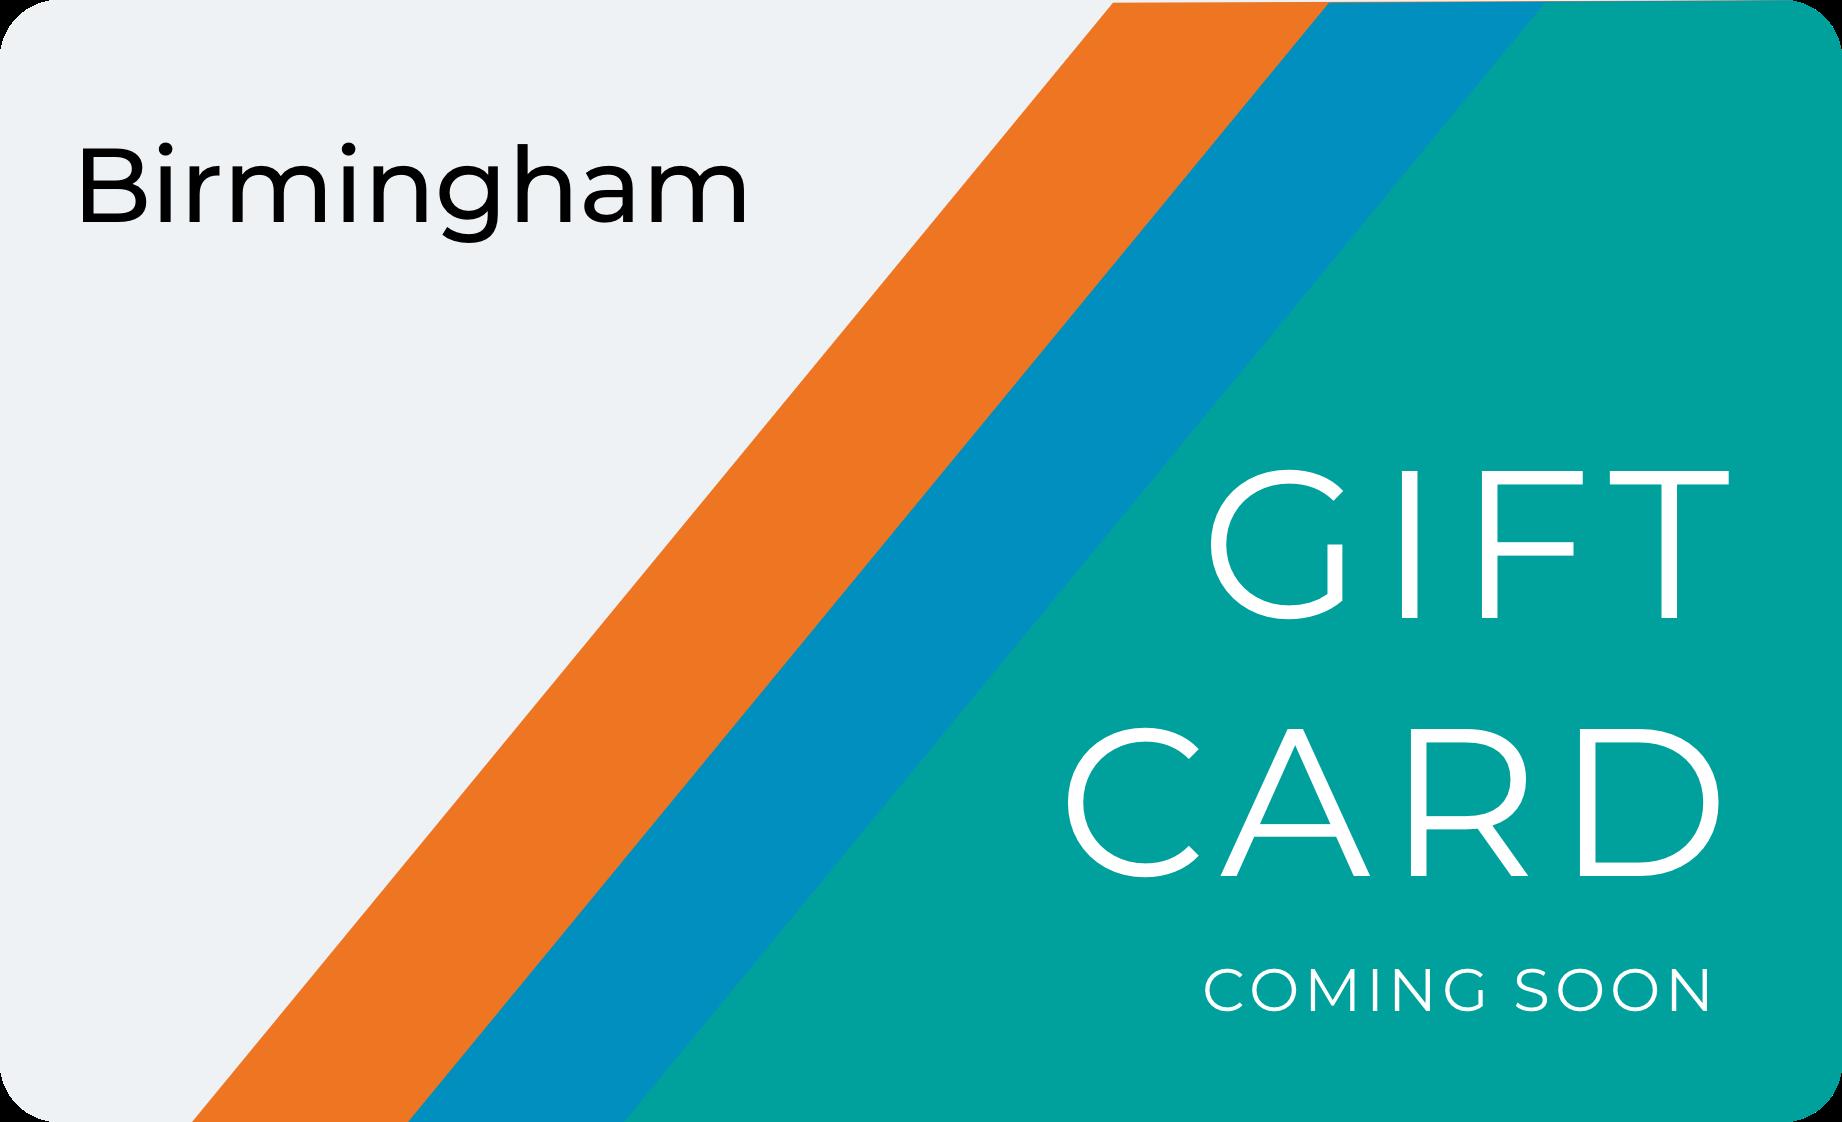 Birmingham Gift Card